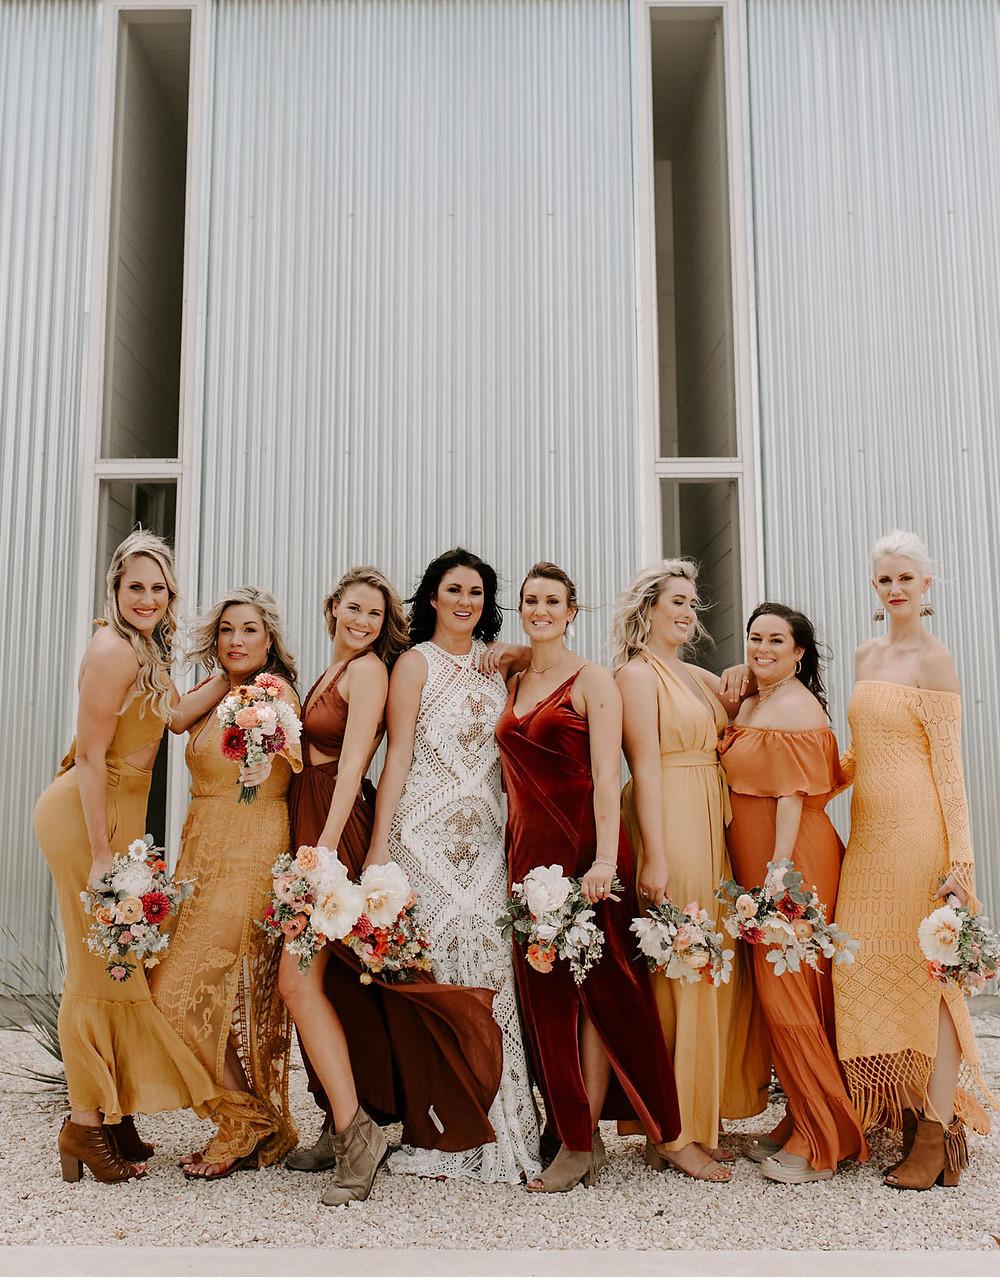 Rust coloured bridesmaids dresses, bridal party group photo